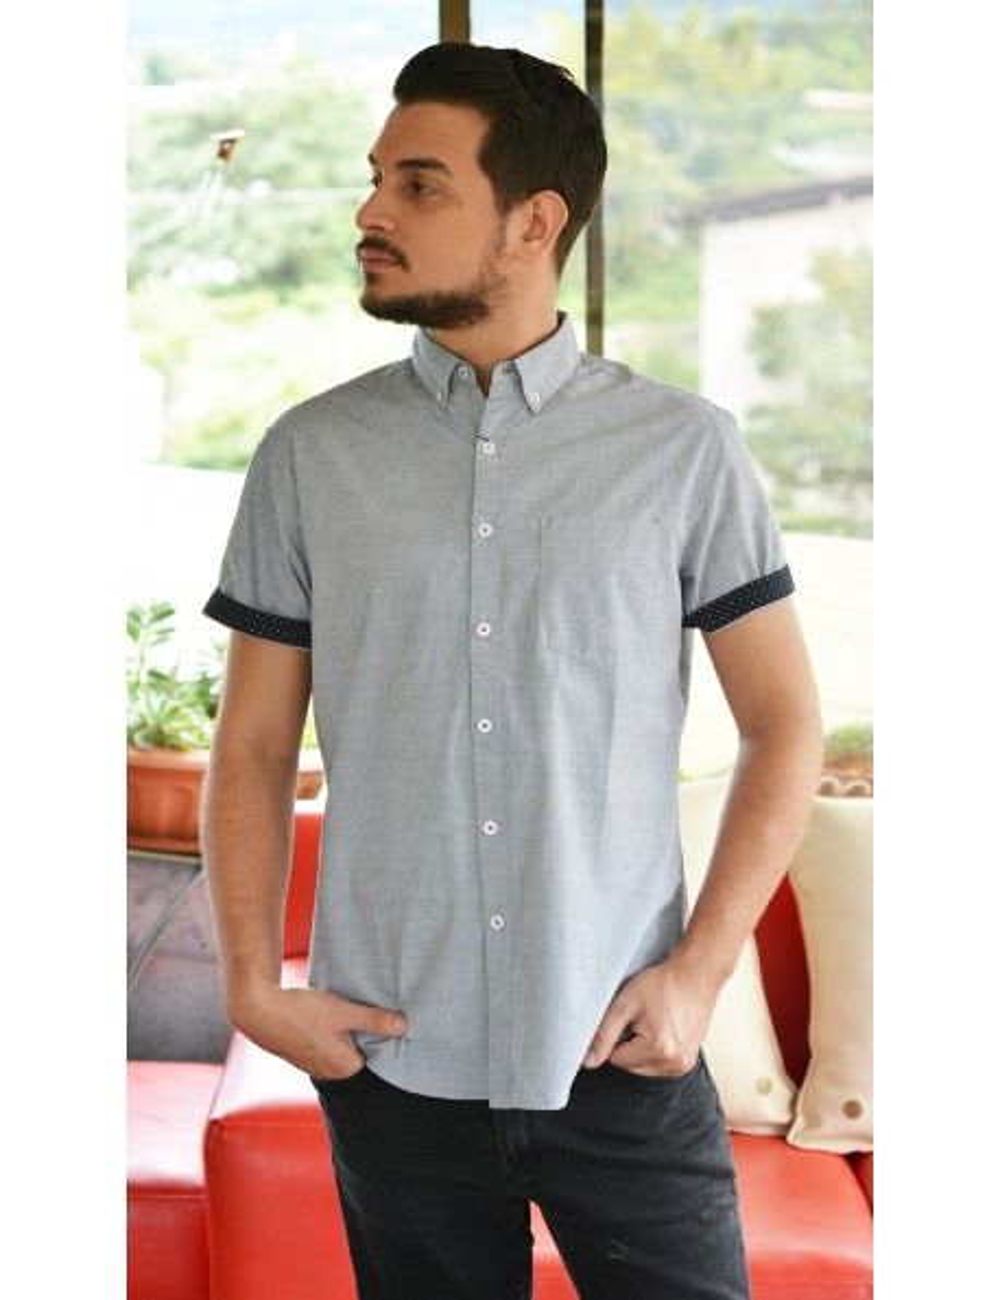 Camisa gris manga corta con estampado negro bolsa frontal